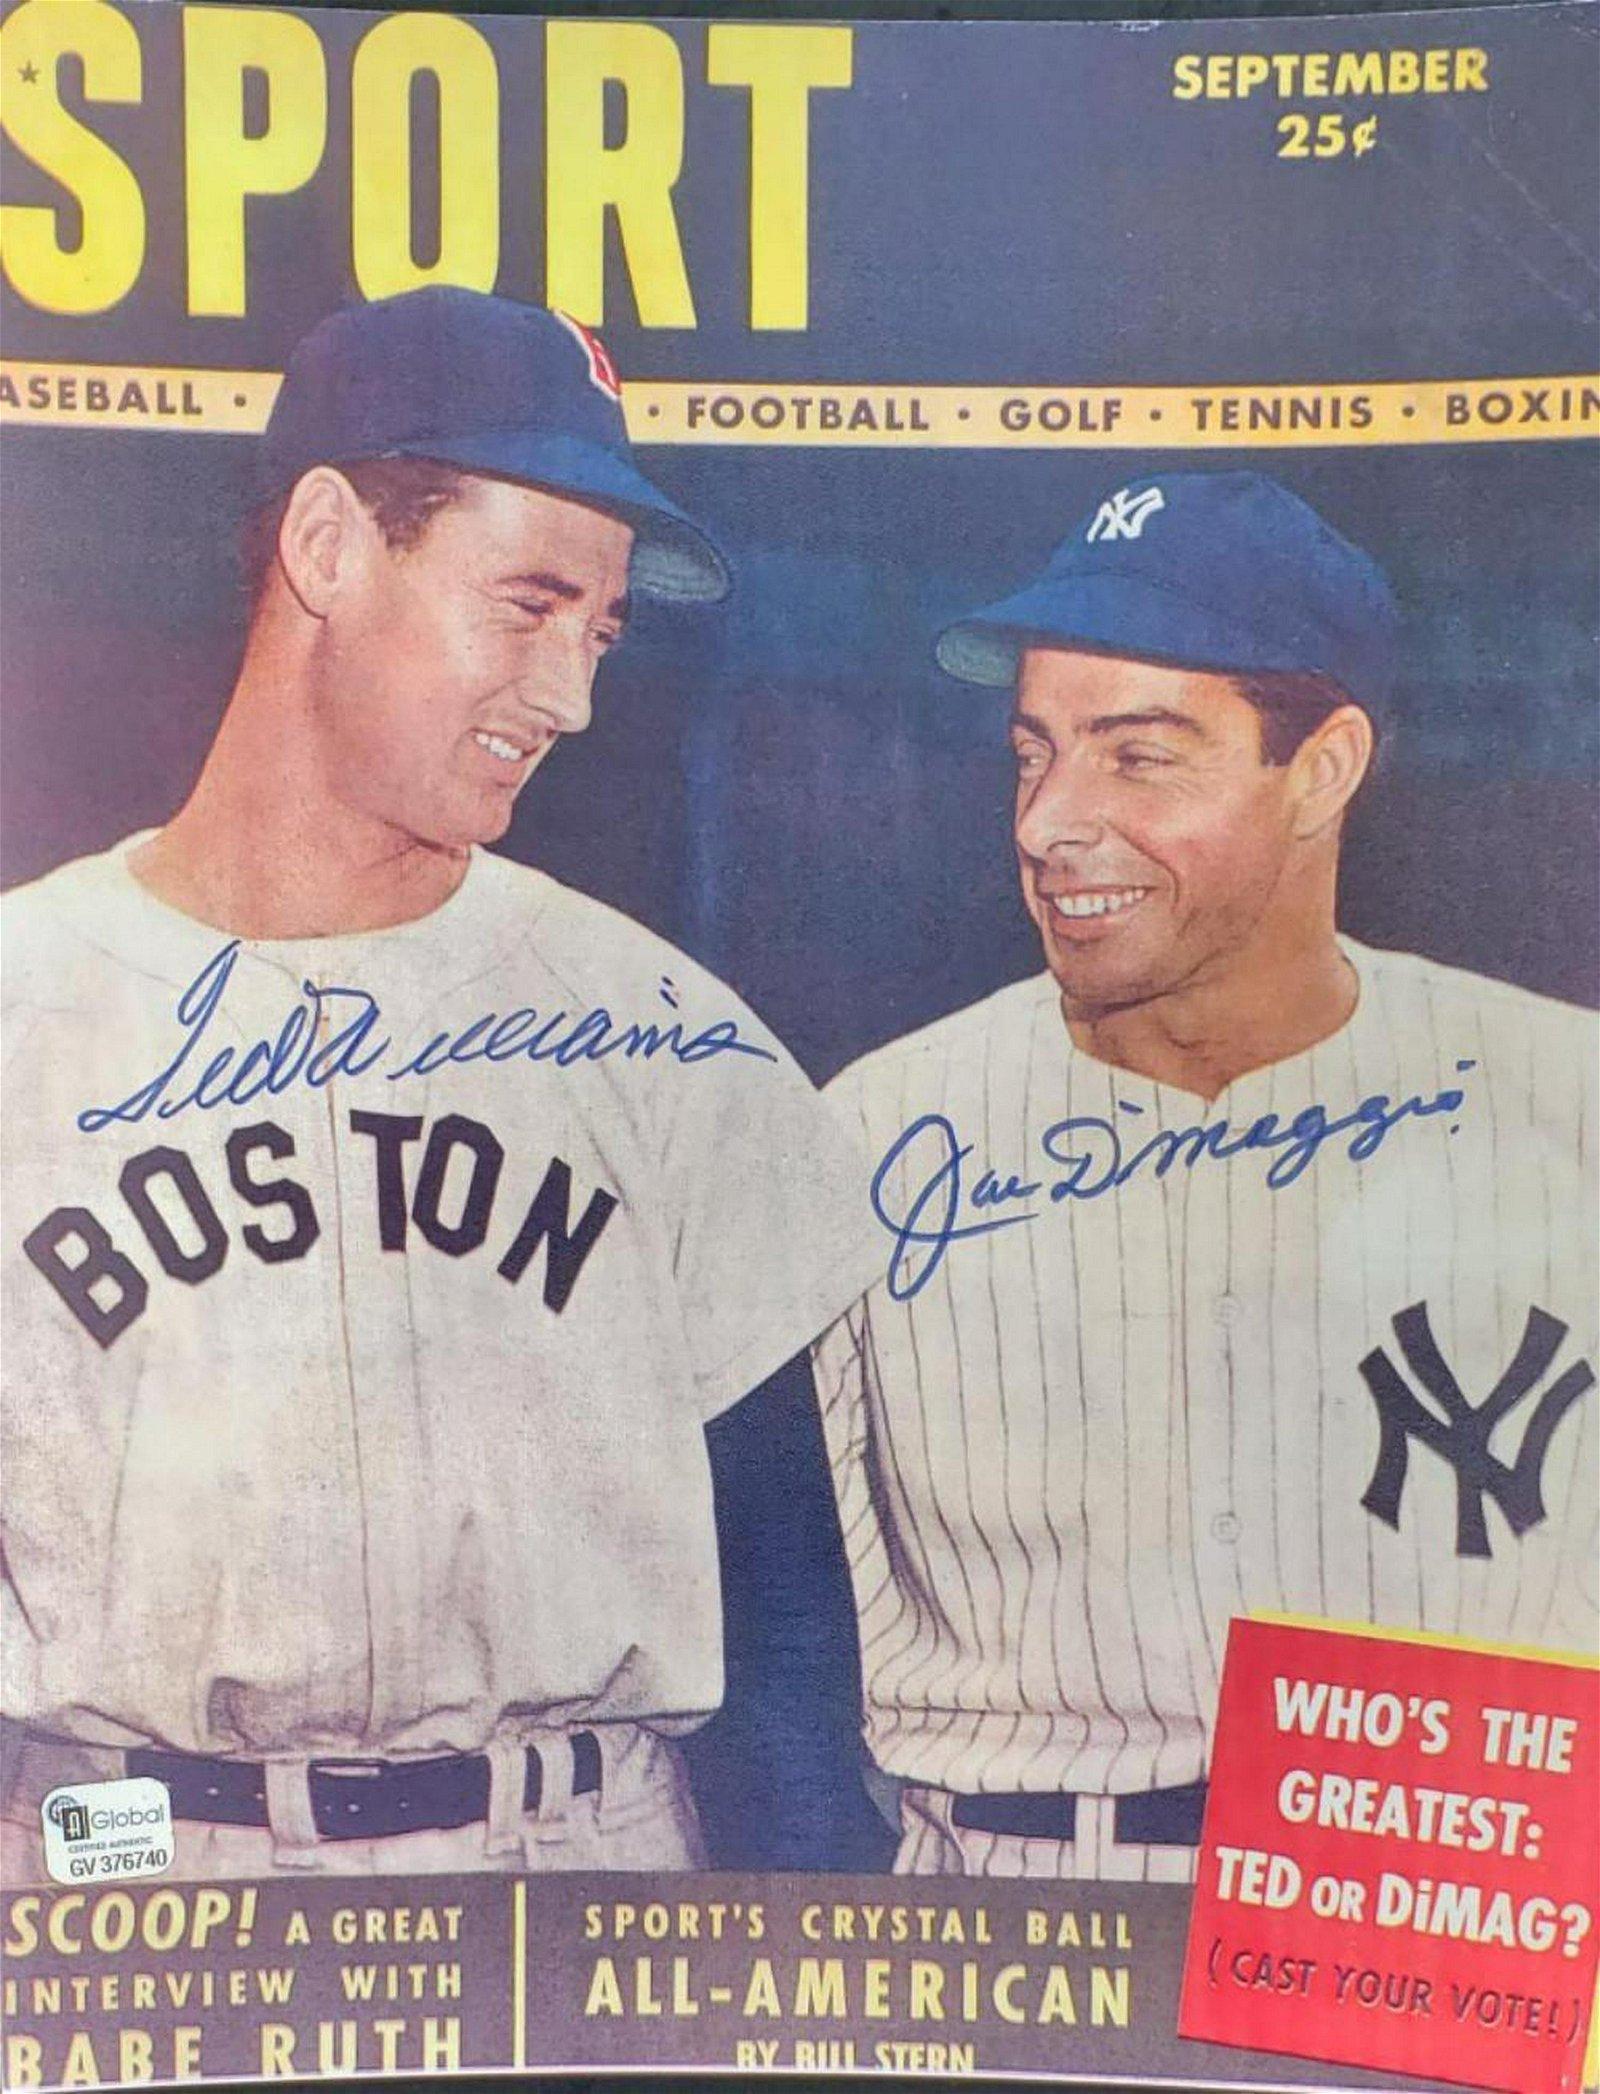 Joe DiMaggio, Ted Williams Autographed 8x10 photo